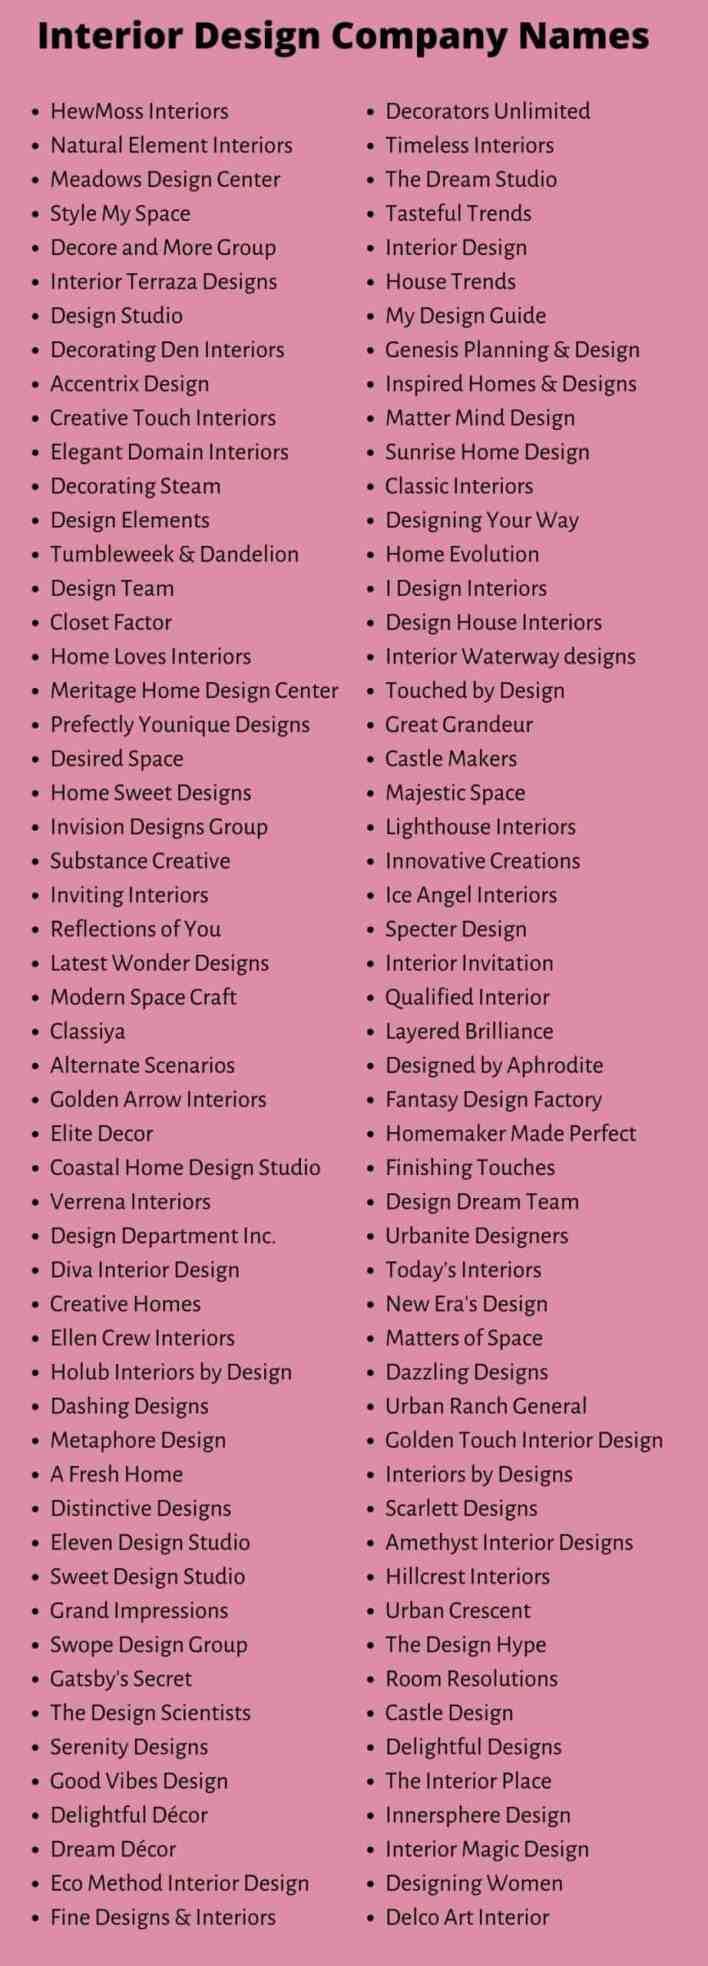 Interior Design Company Names